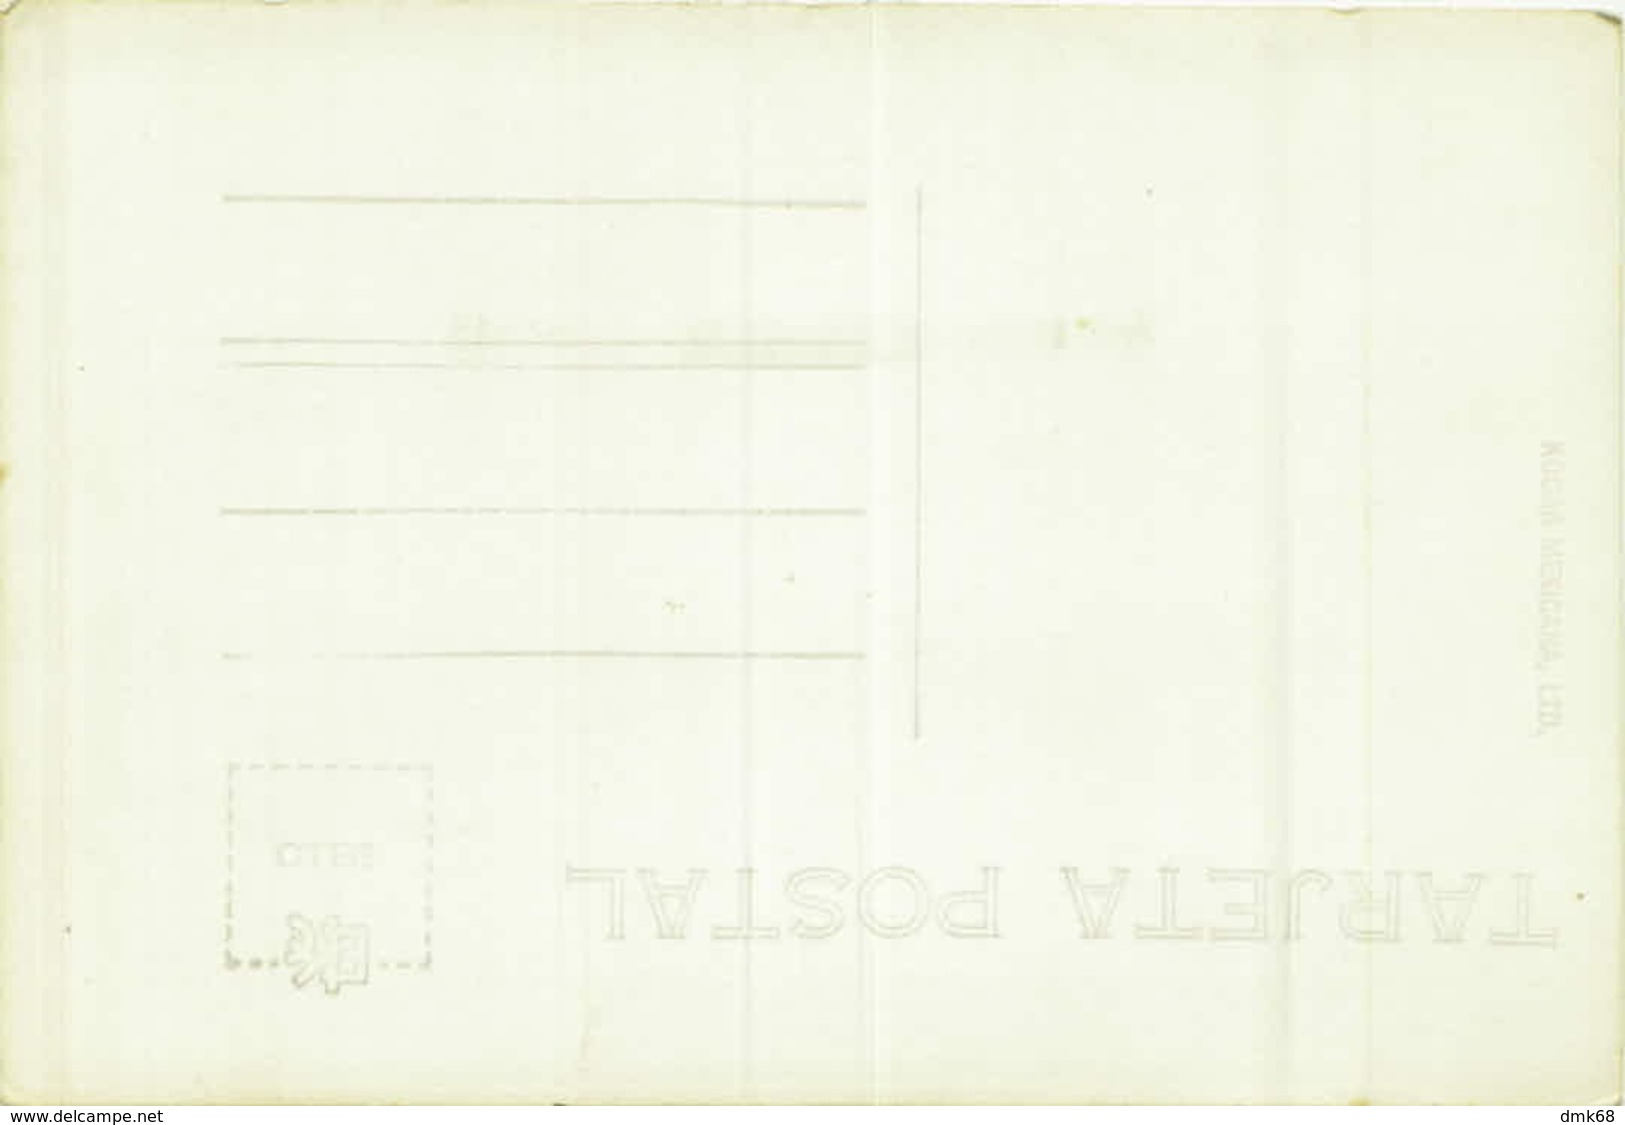 MEXICO - PLAYA DE SALAGUA - MANZANILLO - RPPC POSTCARD - EDIT KODAK MEXICANA LTD . 1940s (BG4638) - Messico